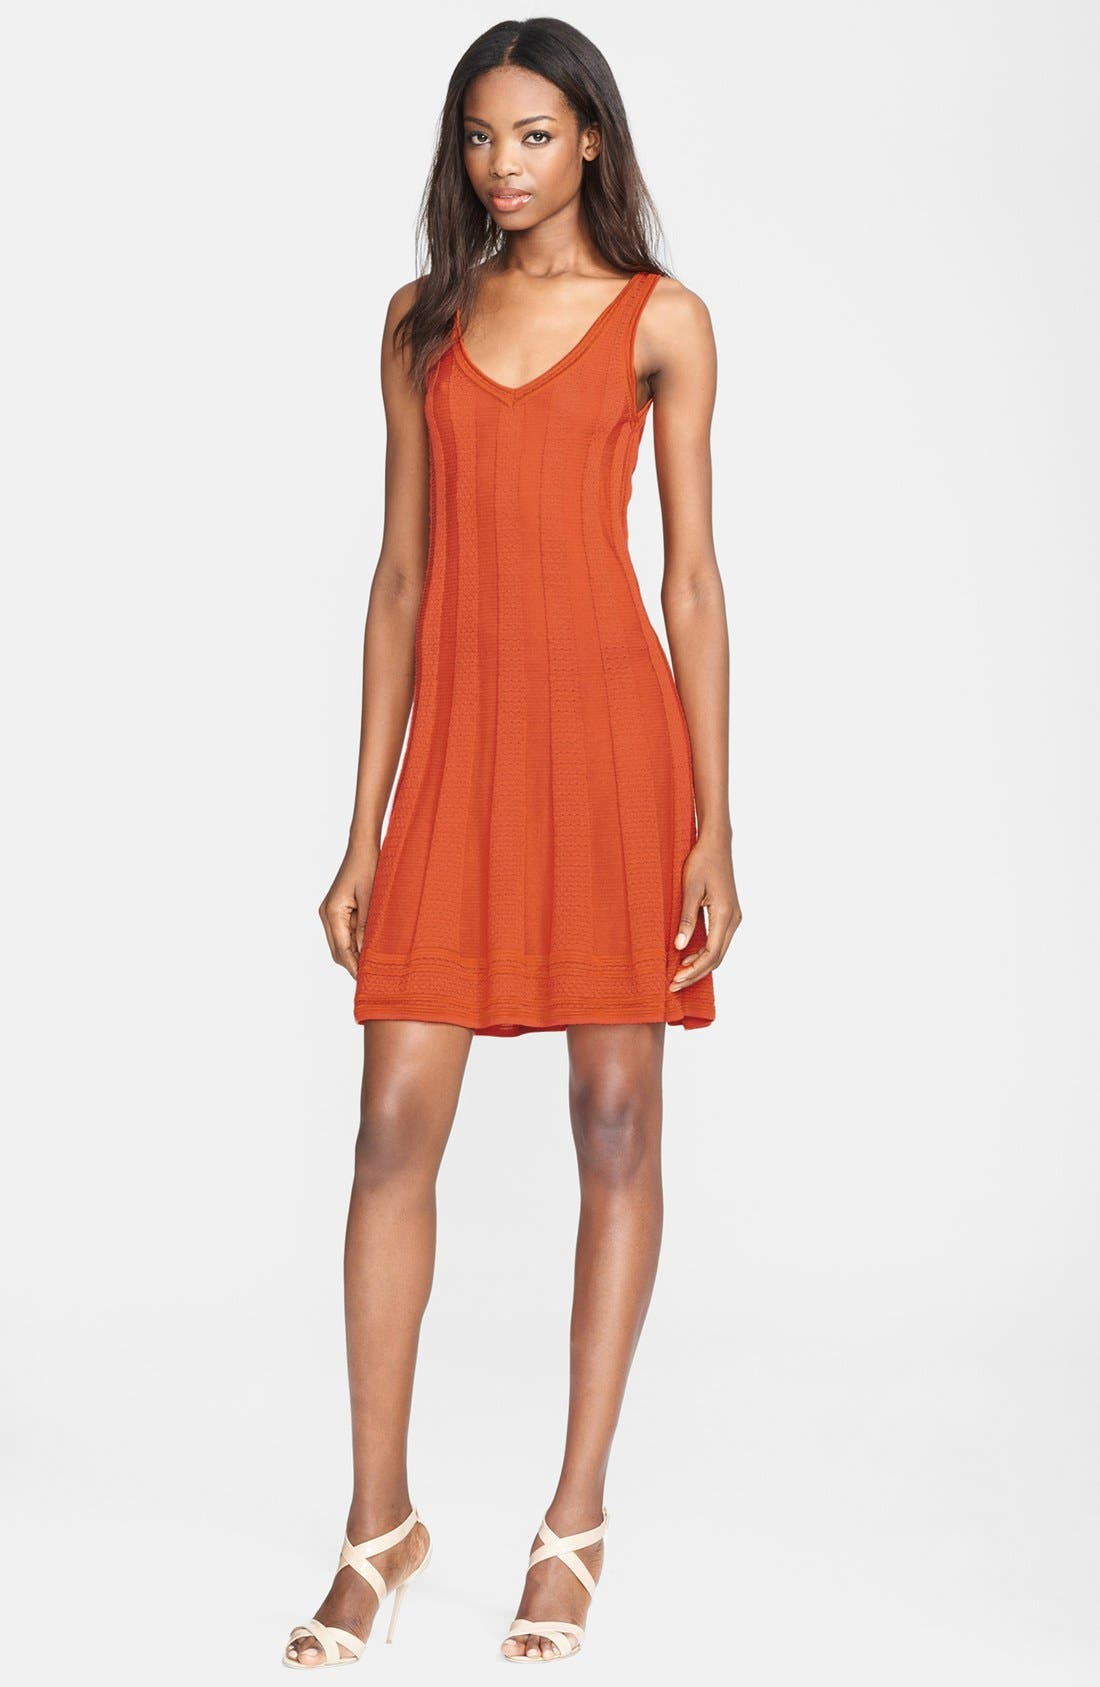 Alternate Image 1 Selected - M Missoni Sleeveless V-Neck Knit Dress